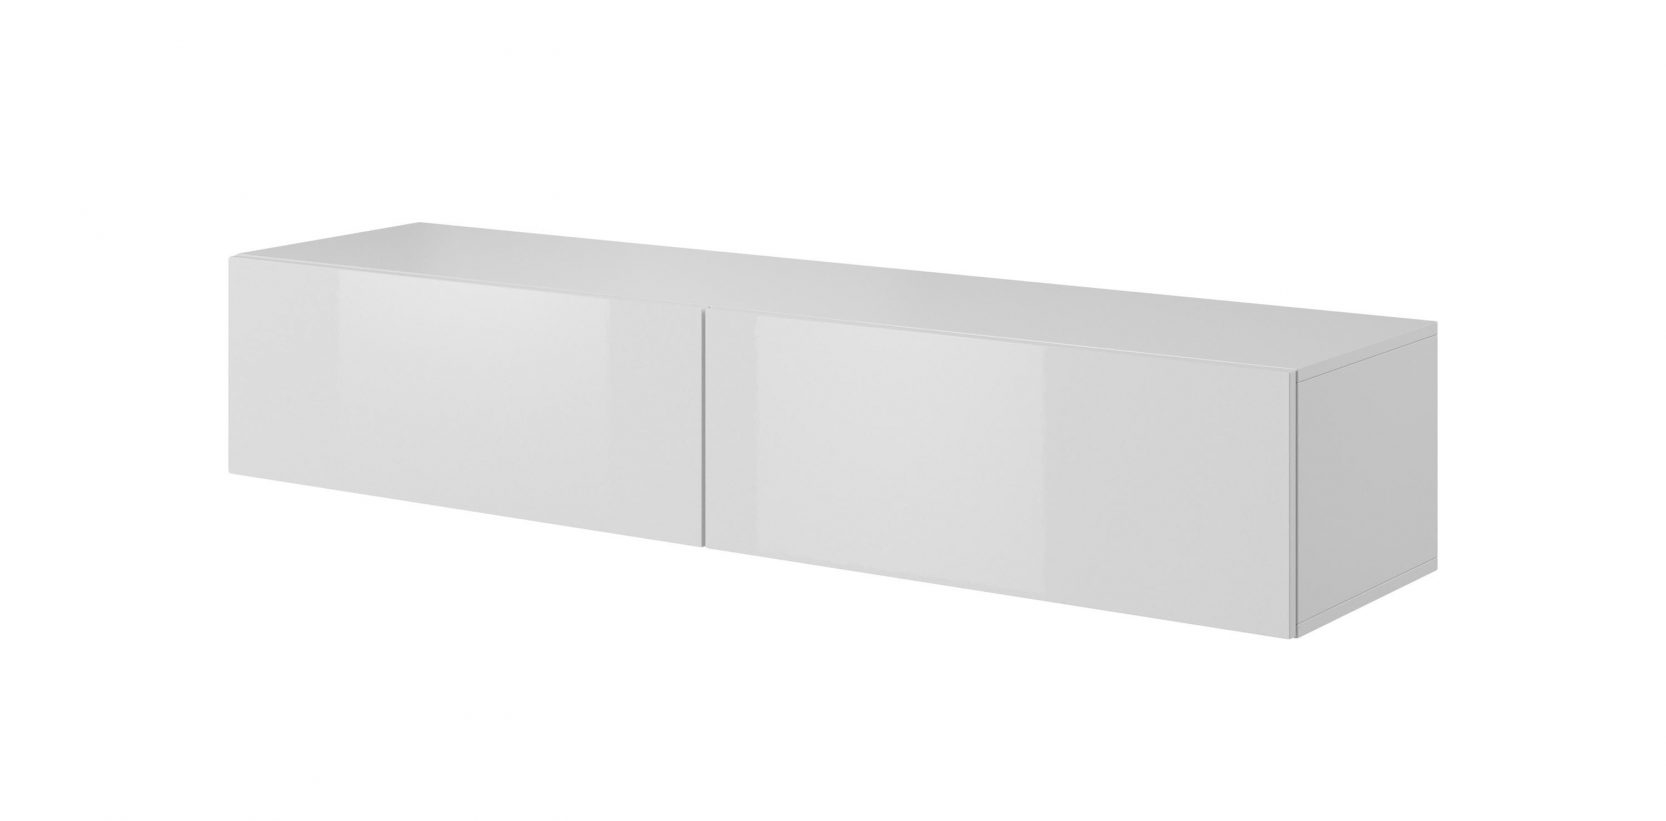 Comoda TV din MDF si pal, cu 2 usi Livo RTV-160W Alb, l160xA40xH30 cm